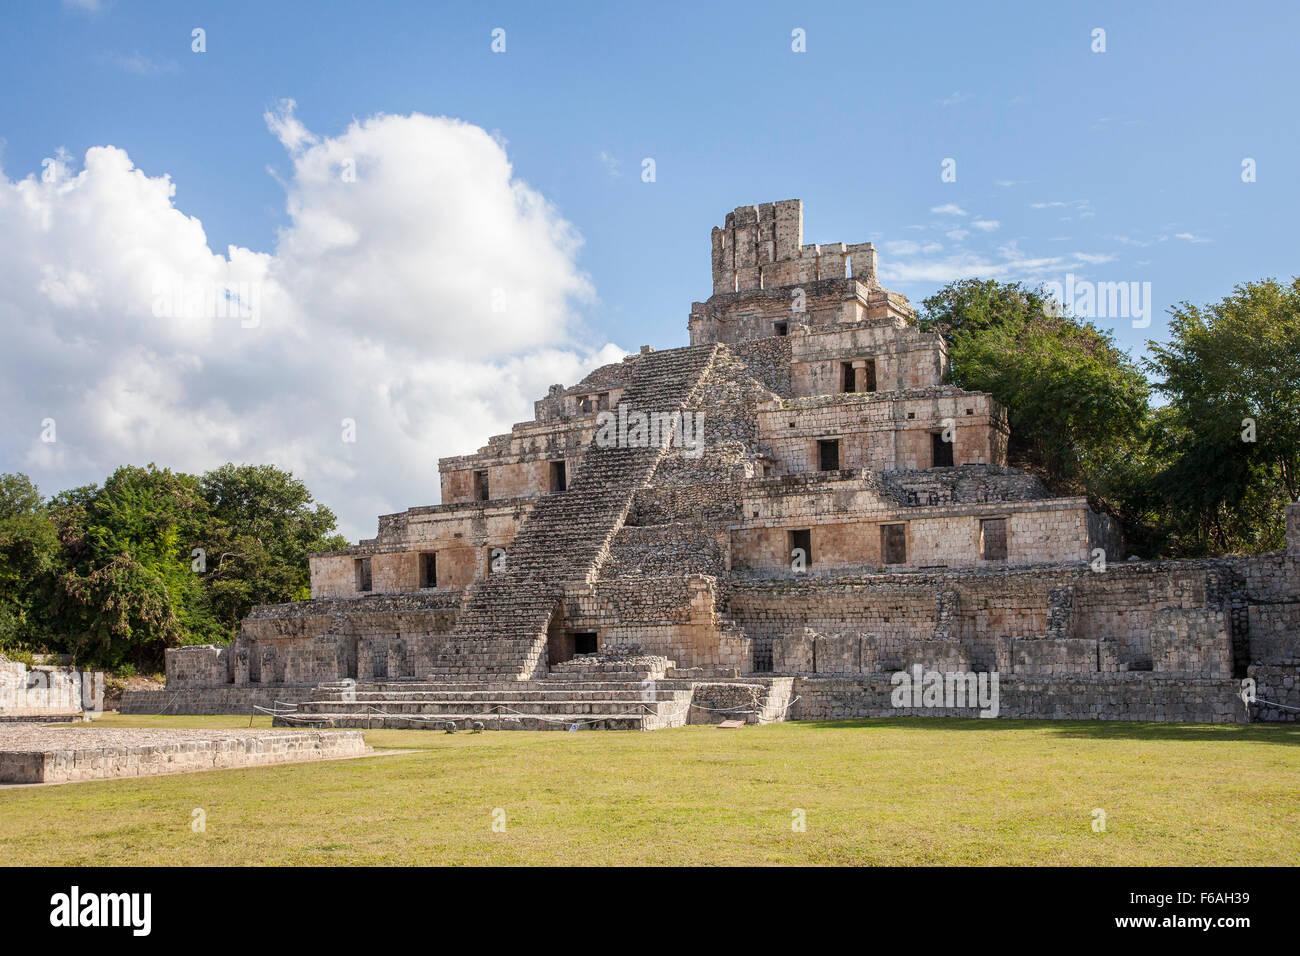 La pyramide à cinq étages les ruines maya de edzna, Campeche. Photo Stock